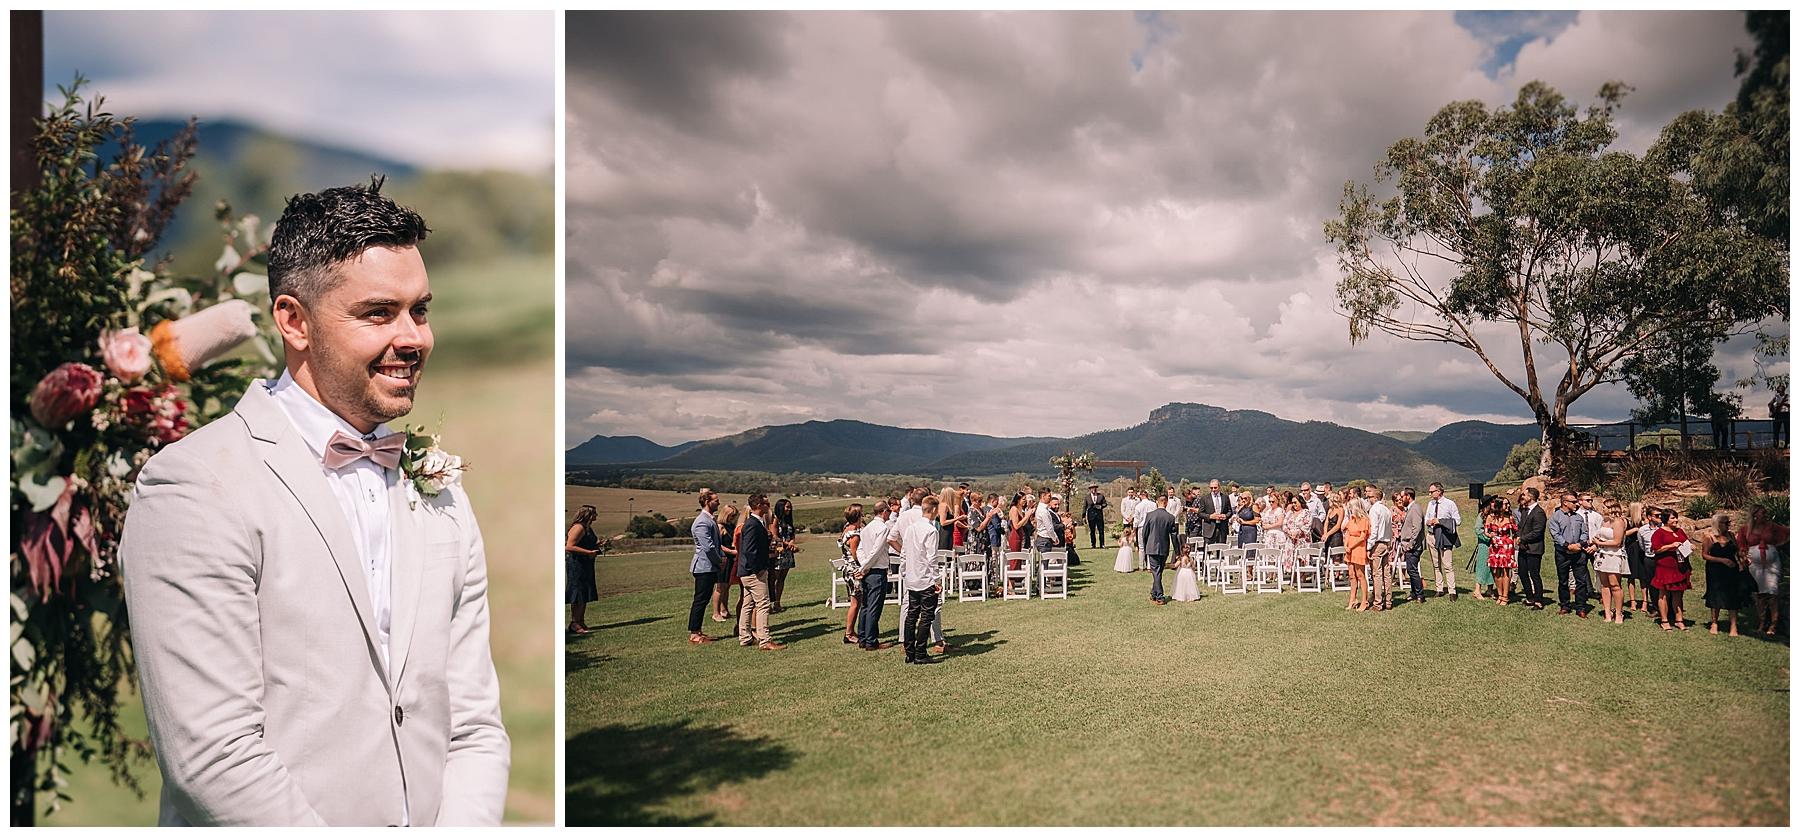 Adam's Peak Wedding Photos + Popcorn Photography_0016.jpg